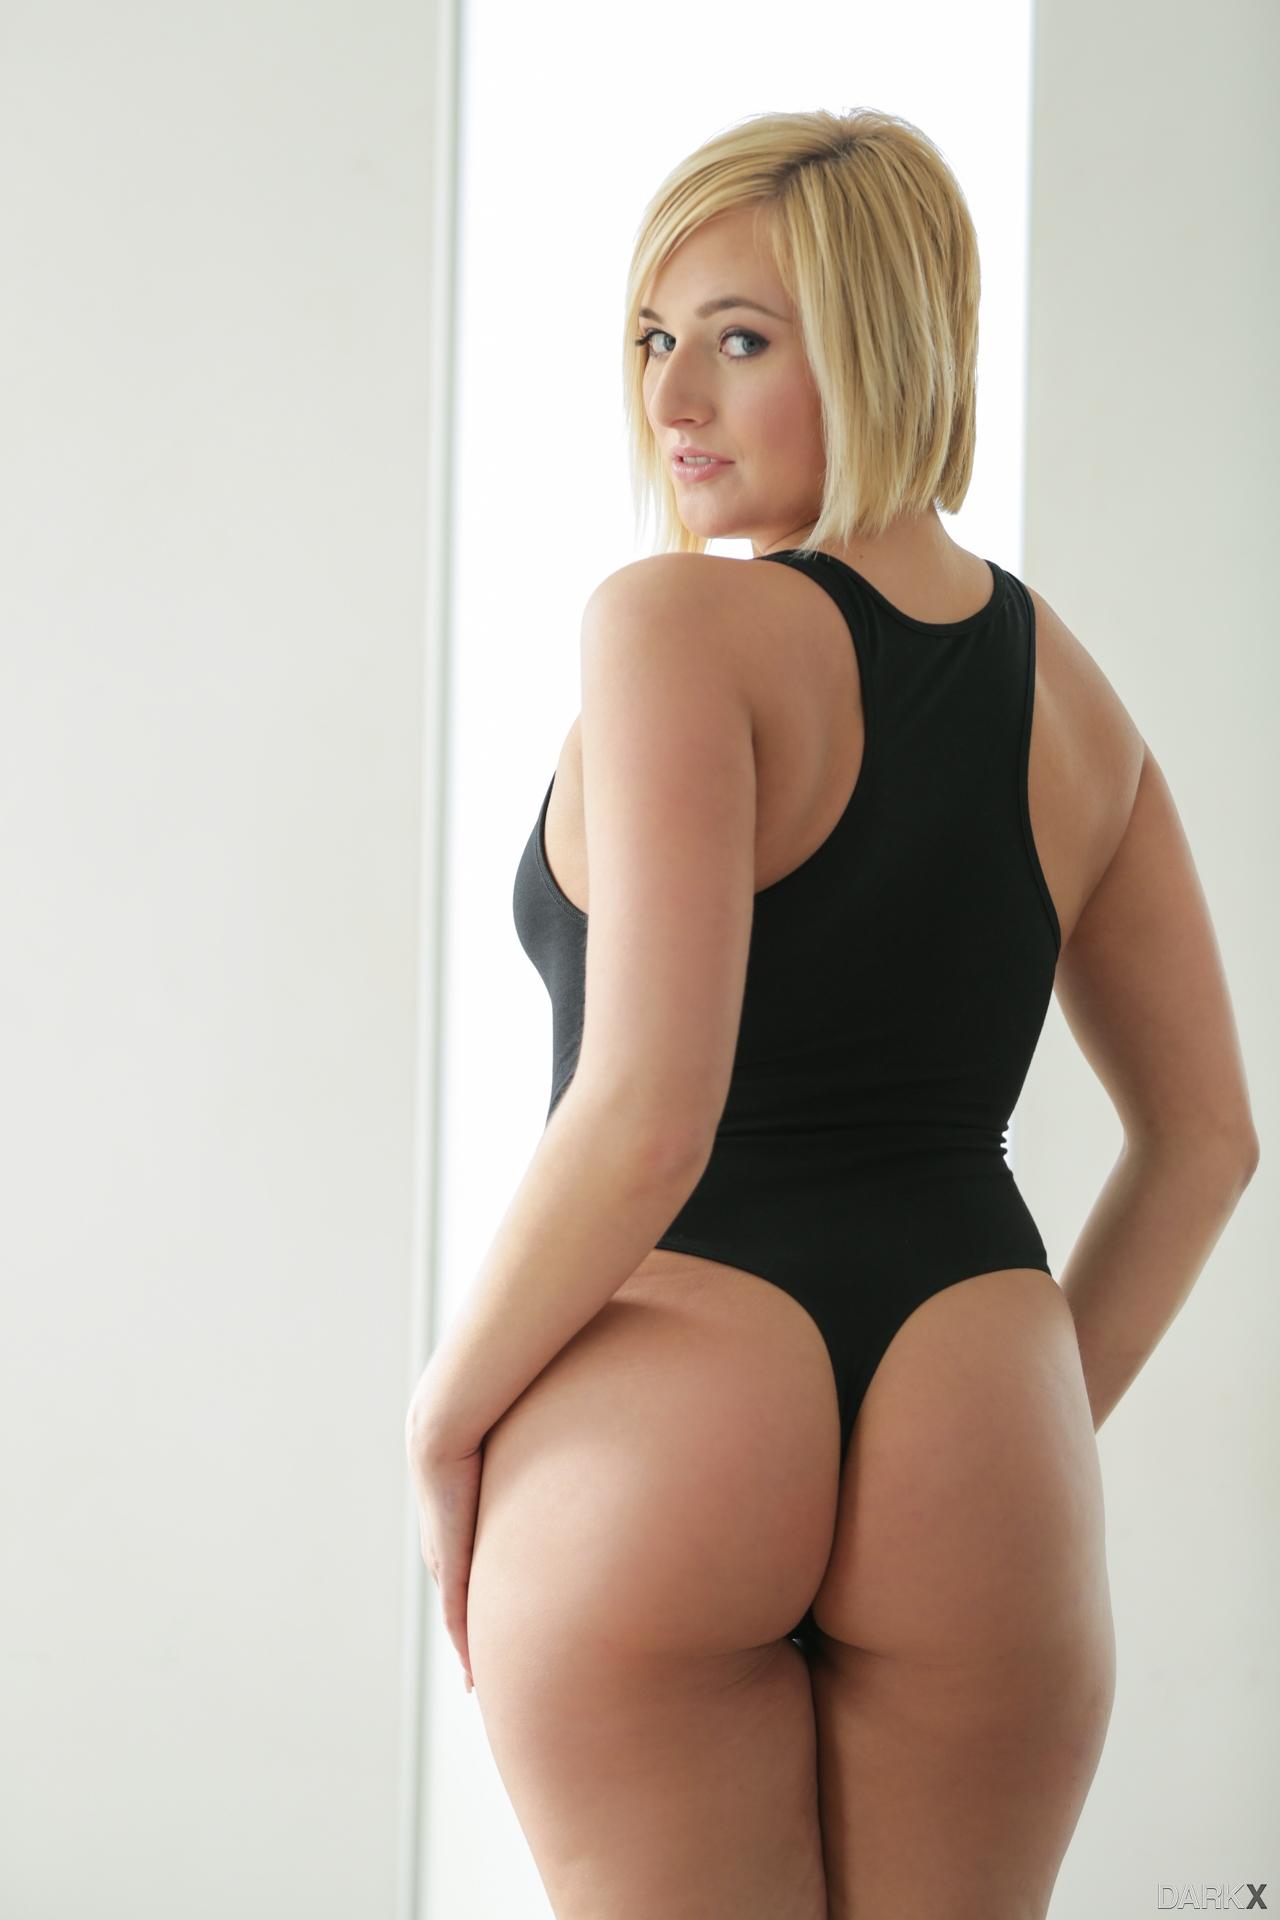 New porn 2020 Free male nudist photos